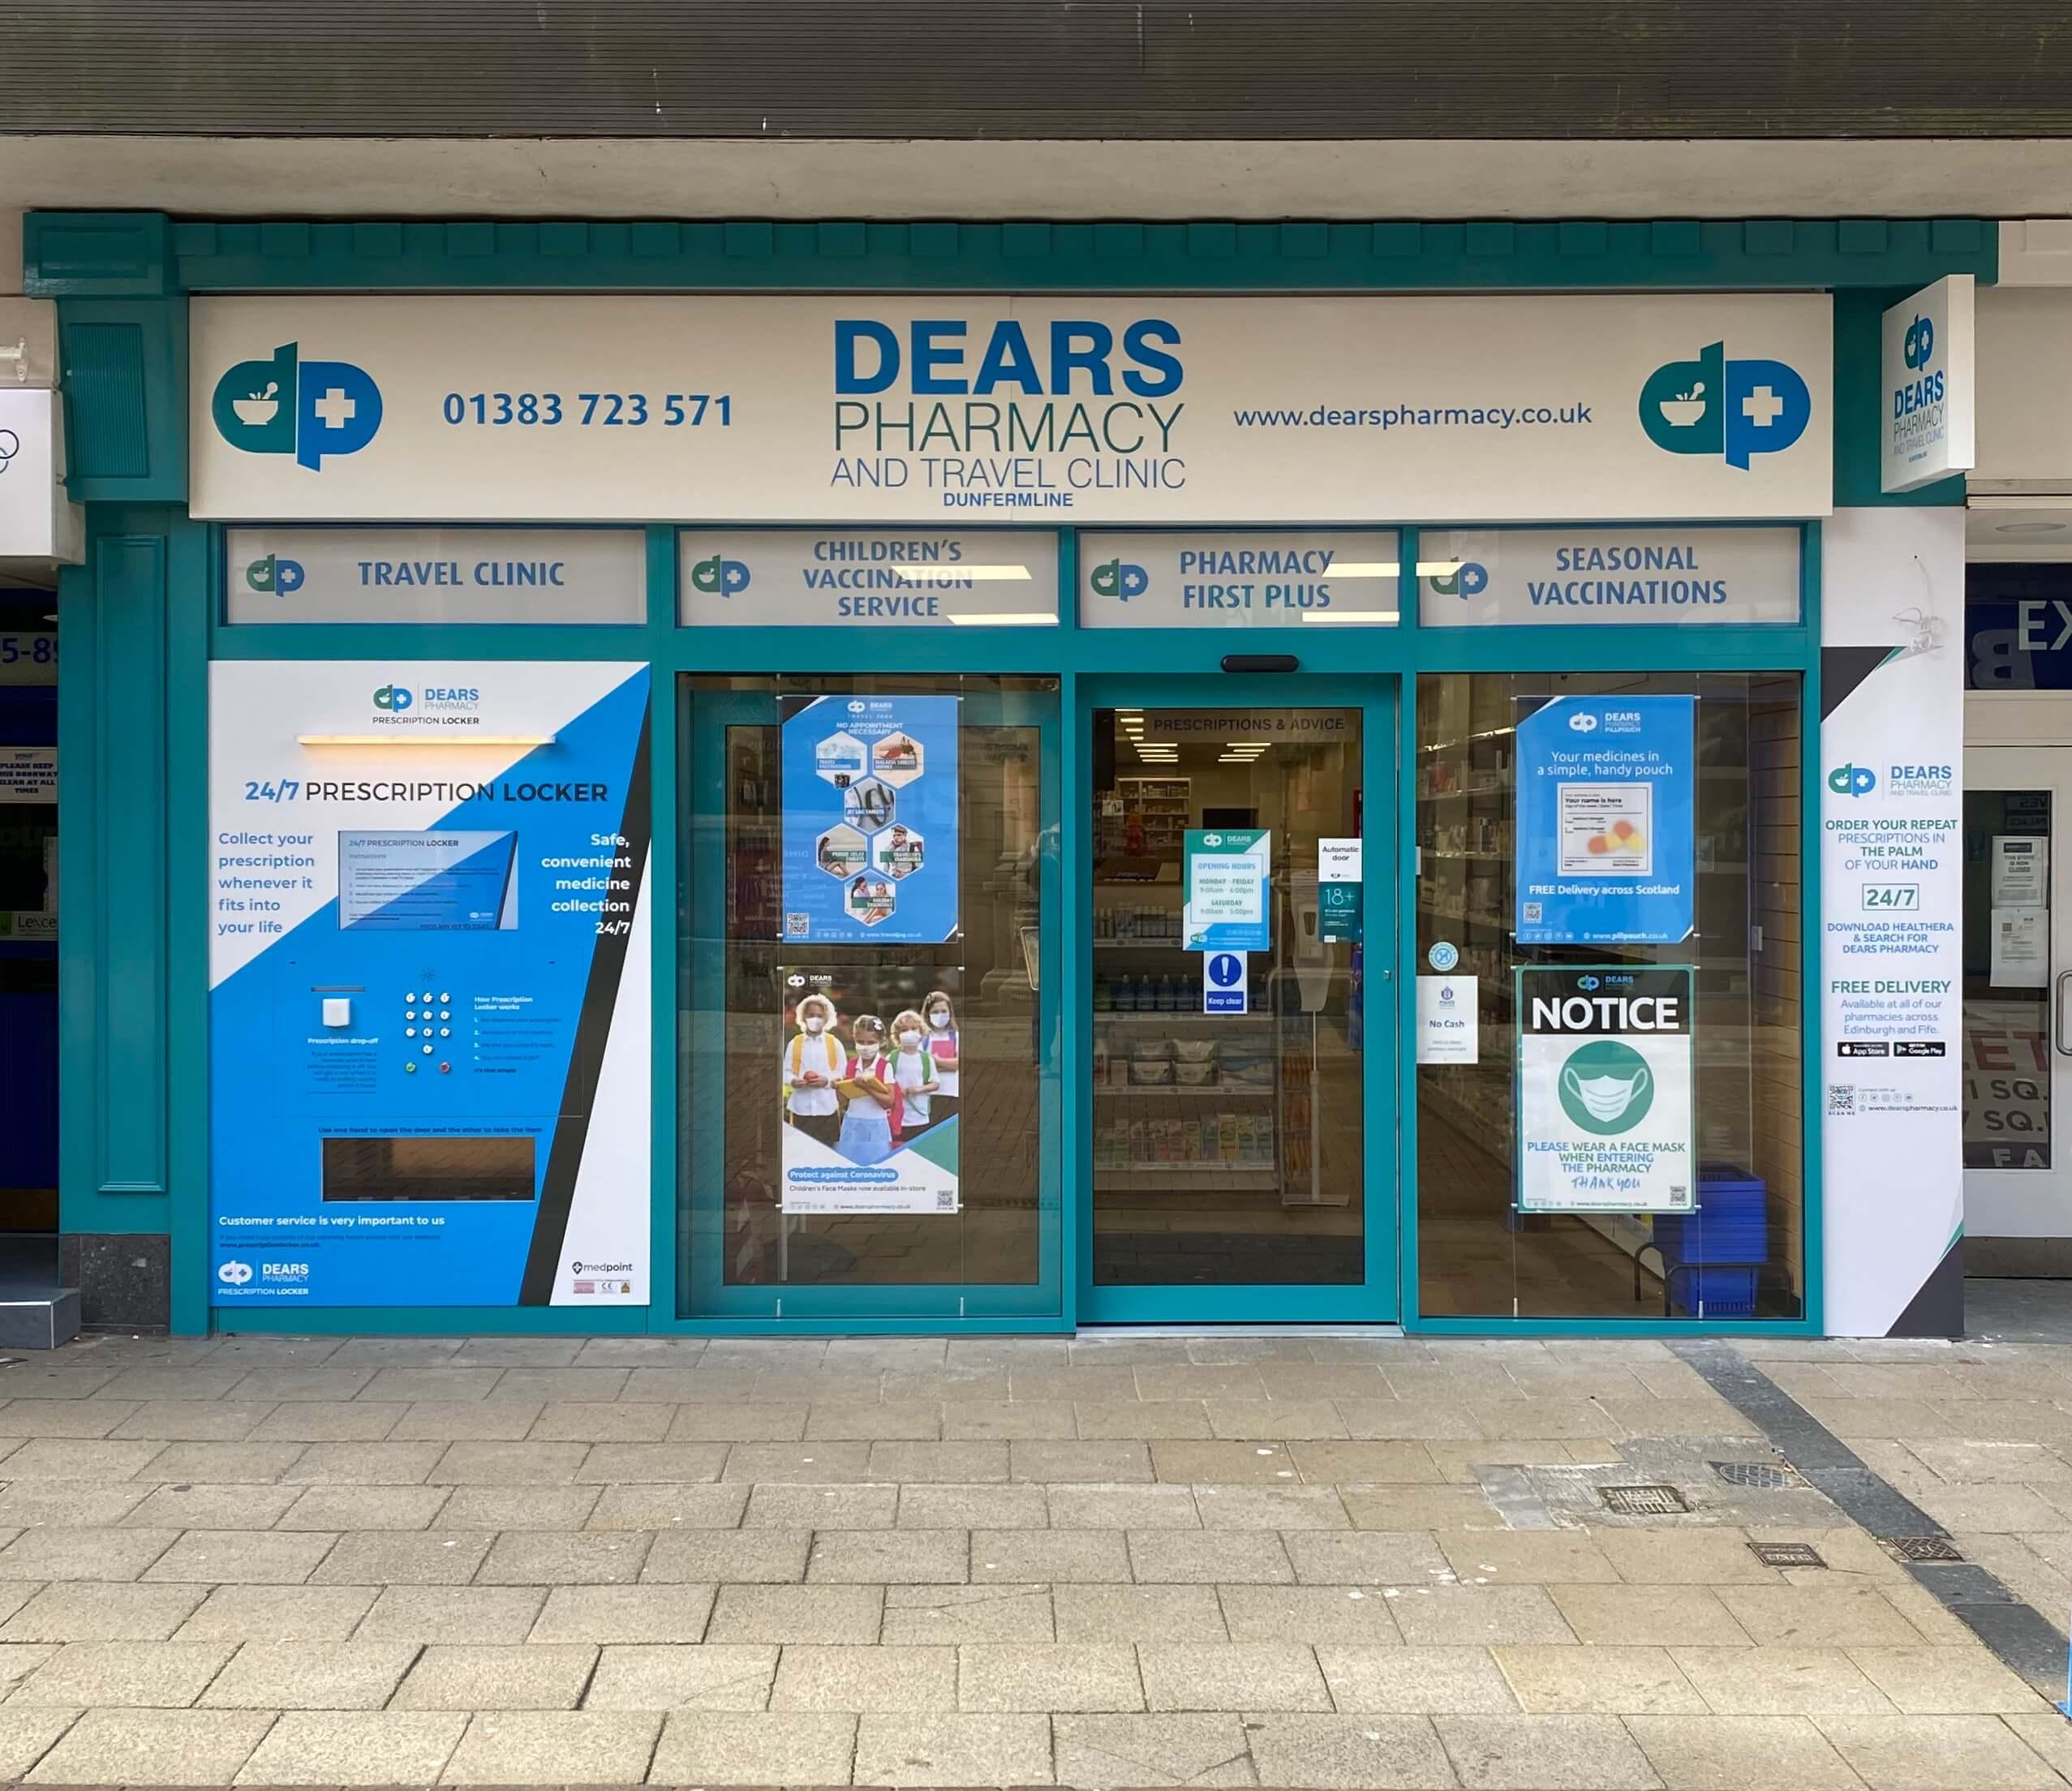 Dears Pharmacy Dunfermline